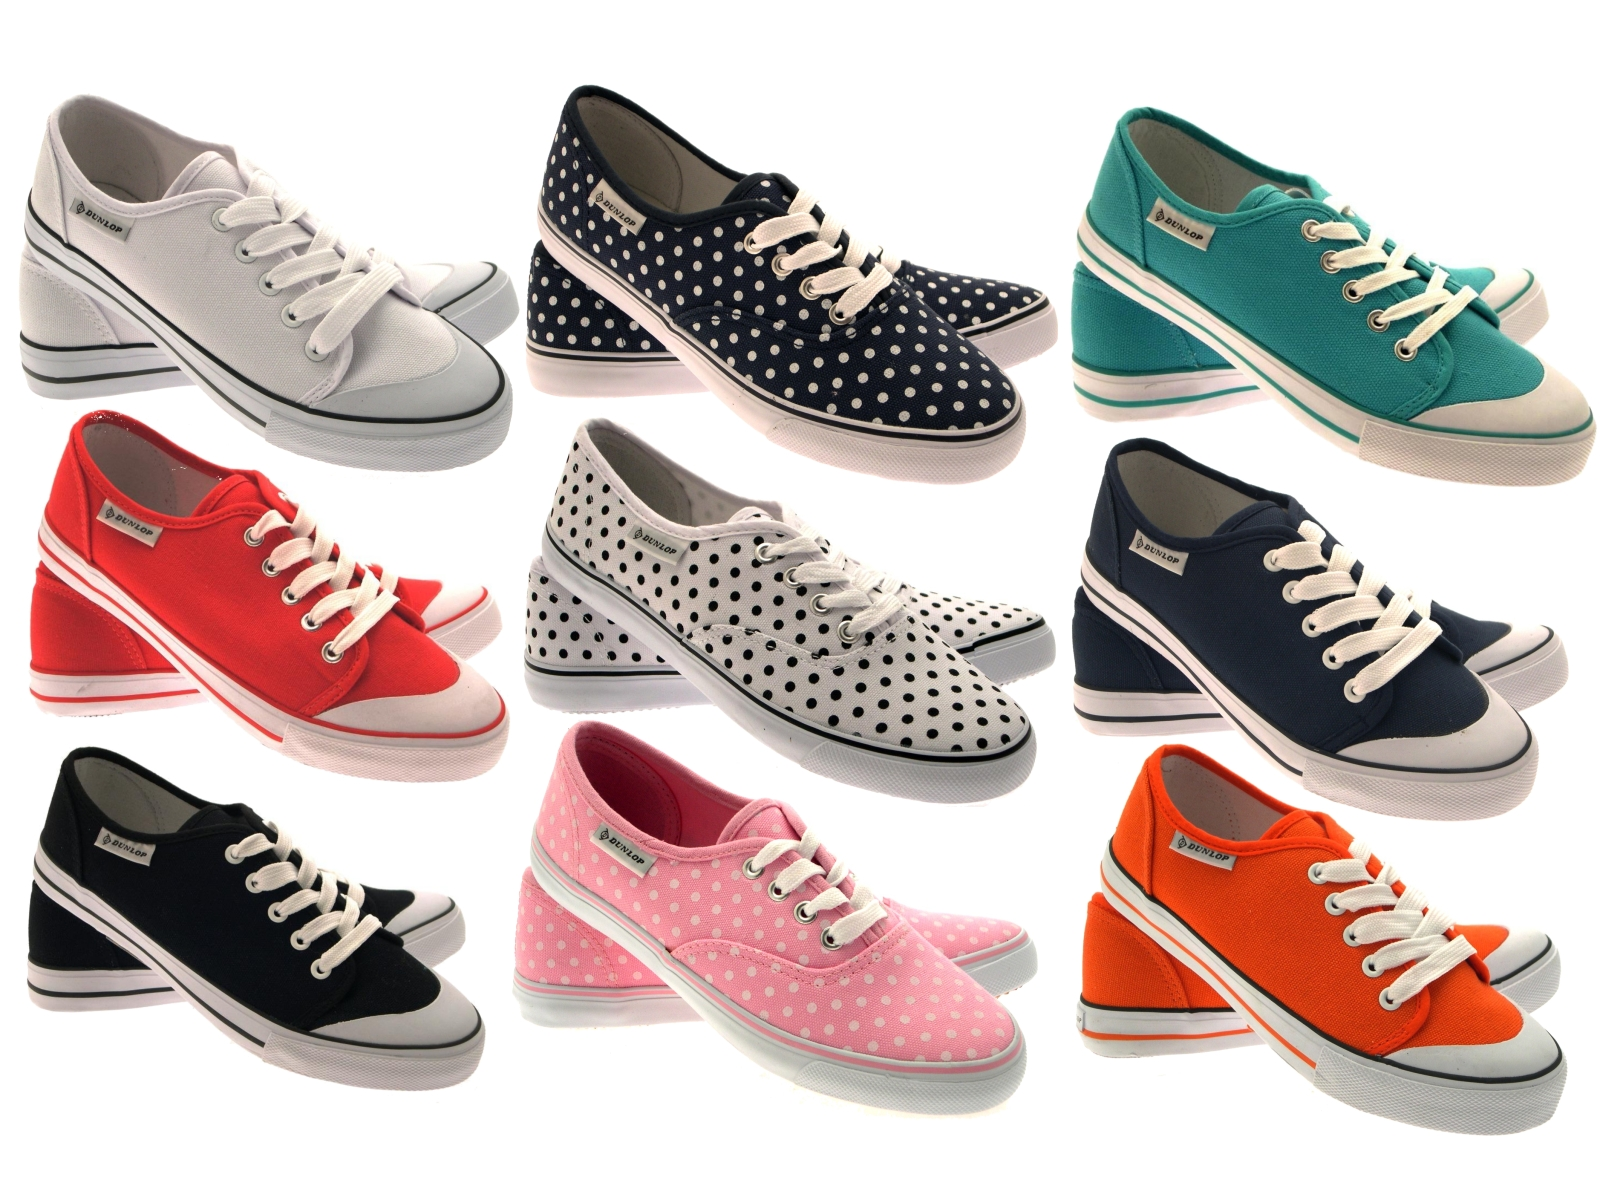 Where To Buy Aqua Shoes In Manila